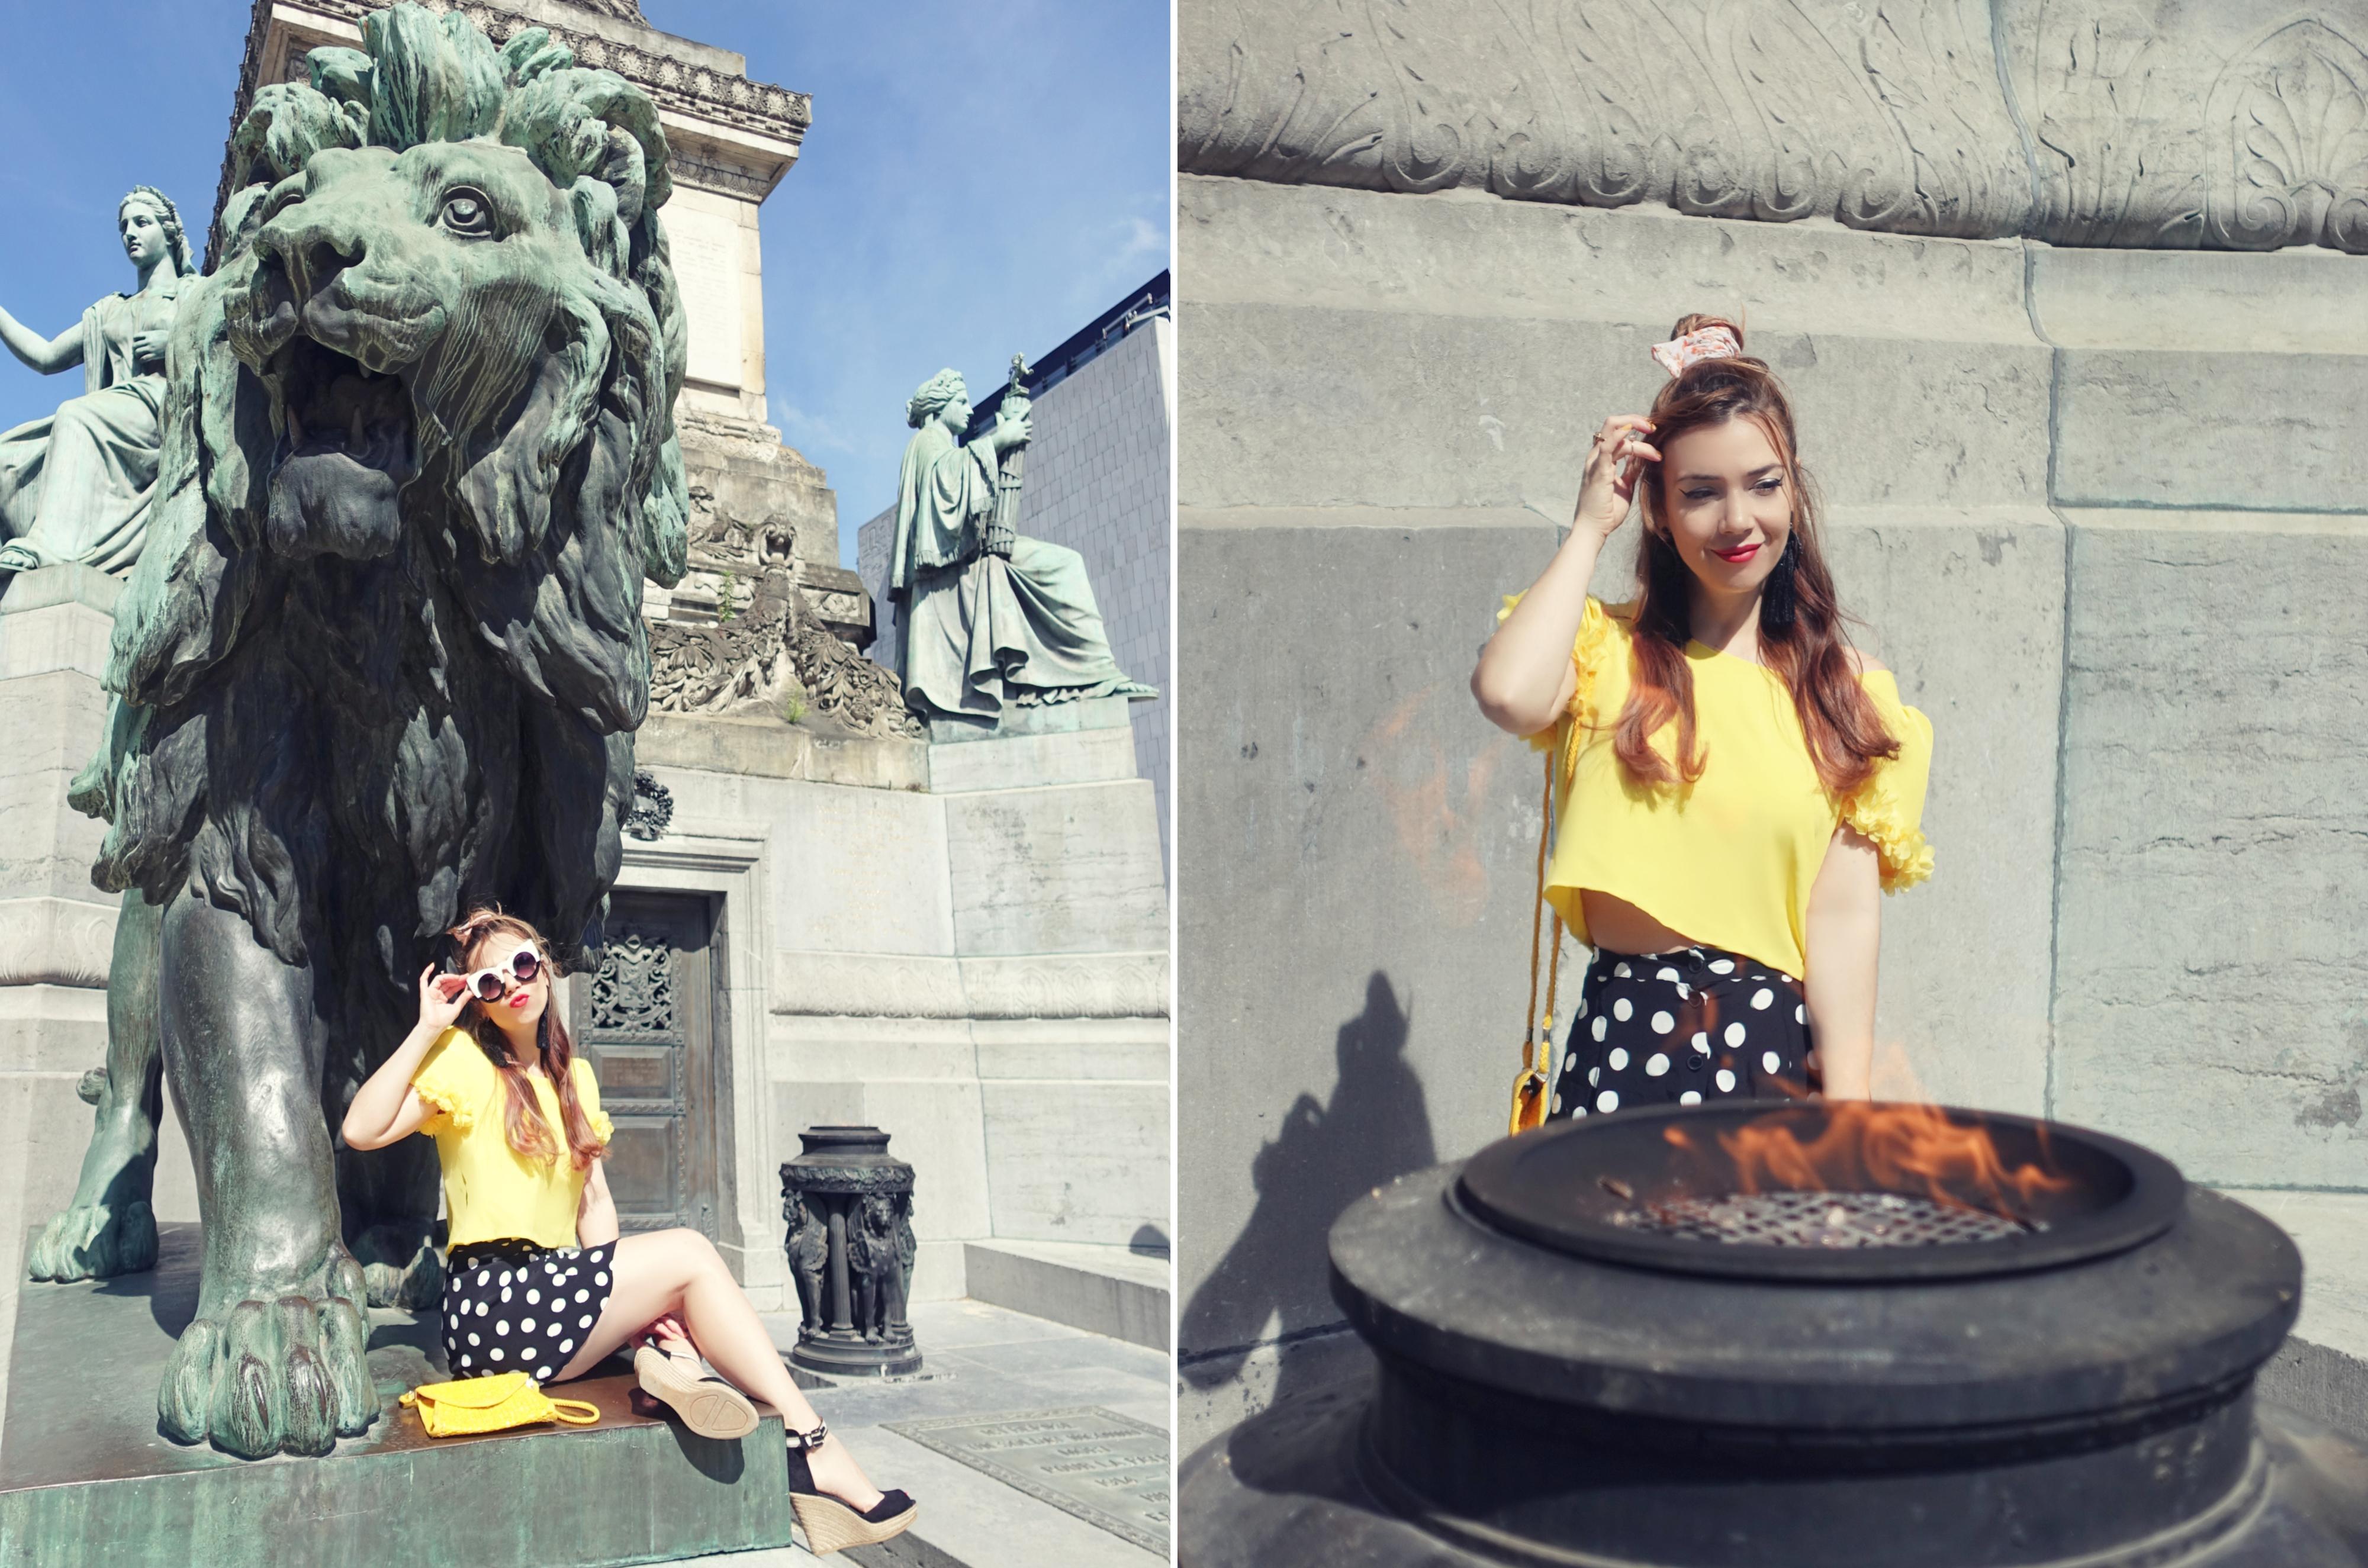 Blusa-aramat-fashion-blog-de-moda-Chicadicta-influencer-PiensaenChic-travelblogger-Chic-adicta-falda-de-lunares-Piensa-en-Chic